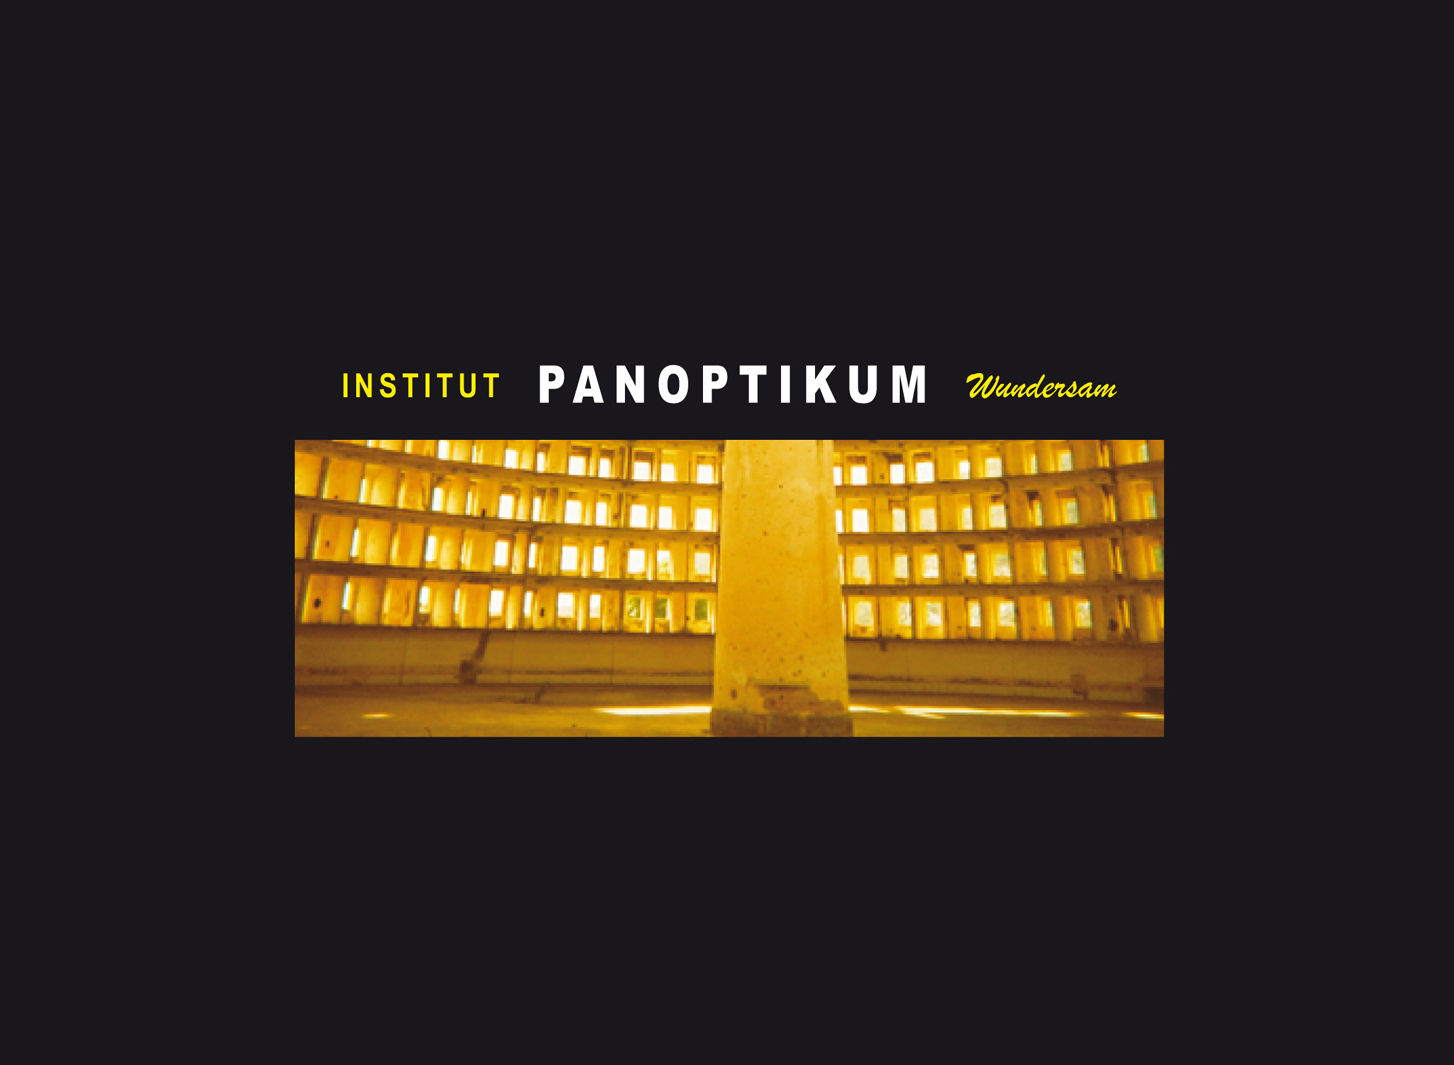 Institut PANOPTIKUM Gesamtwerkszenarium